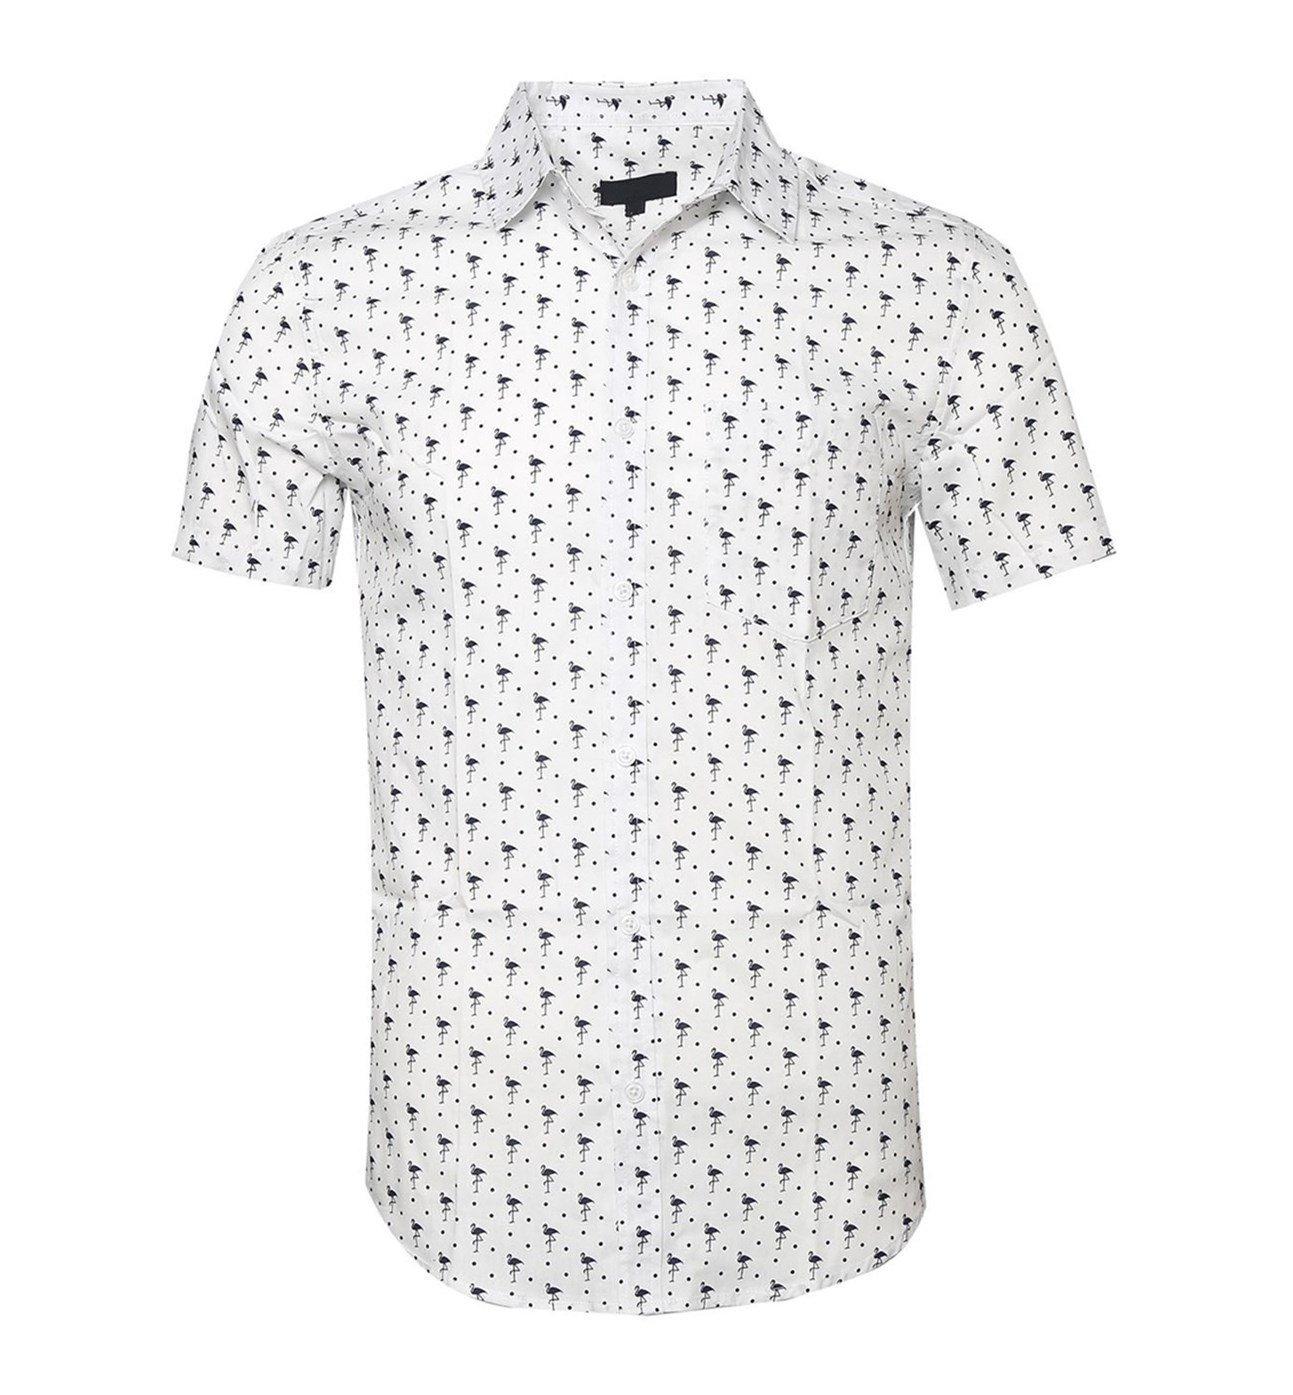 TOPORUS Mens Casual Swan Printed Short Sleeve Button Down Shirts B-White 2XL